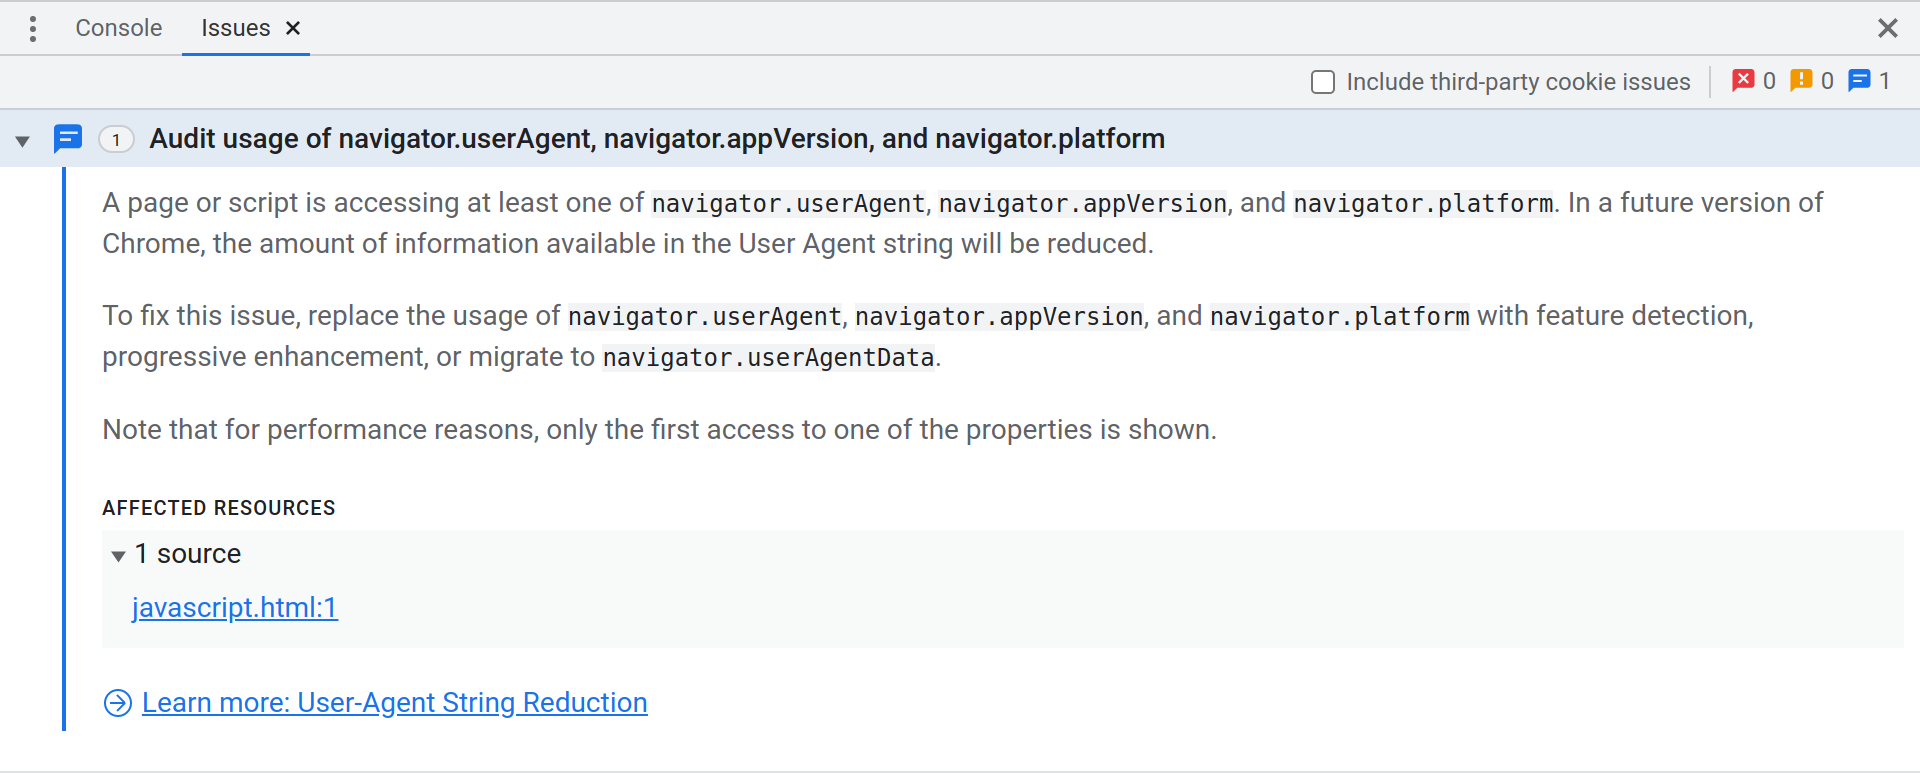 DevTools Issues panel showing an Improvement issue advising the developer to audit usage of navigator.userAgent, navigator.appVersion, and navigator.platform